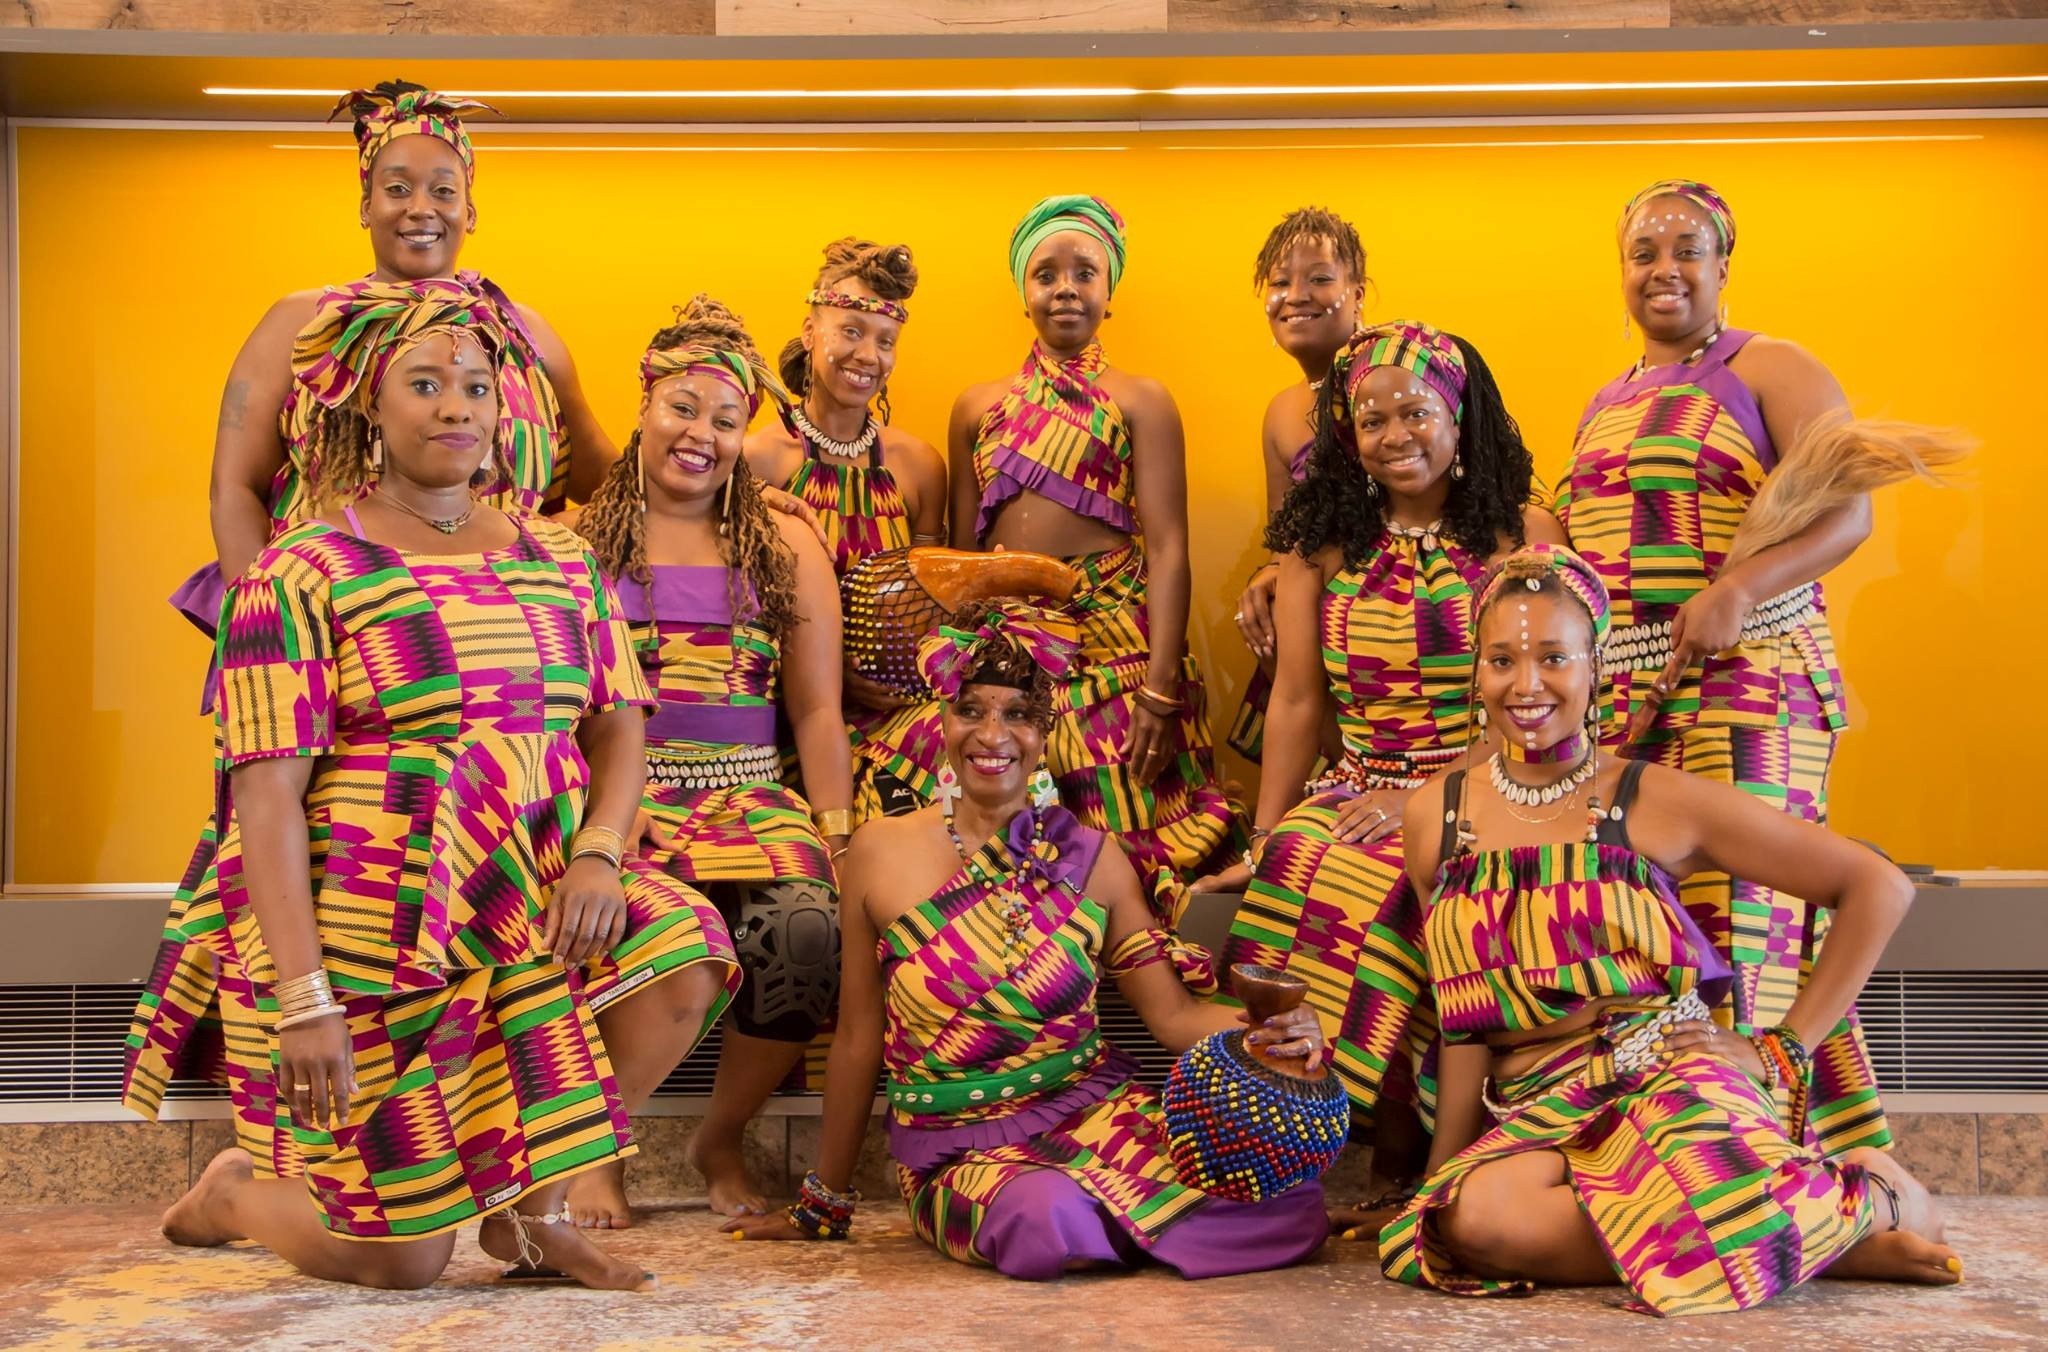 Otesha African Dancers by Larente Hamlin